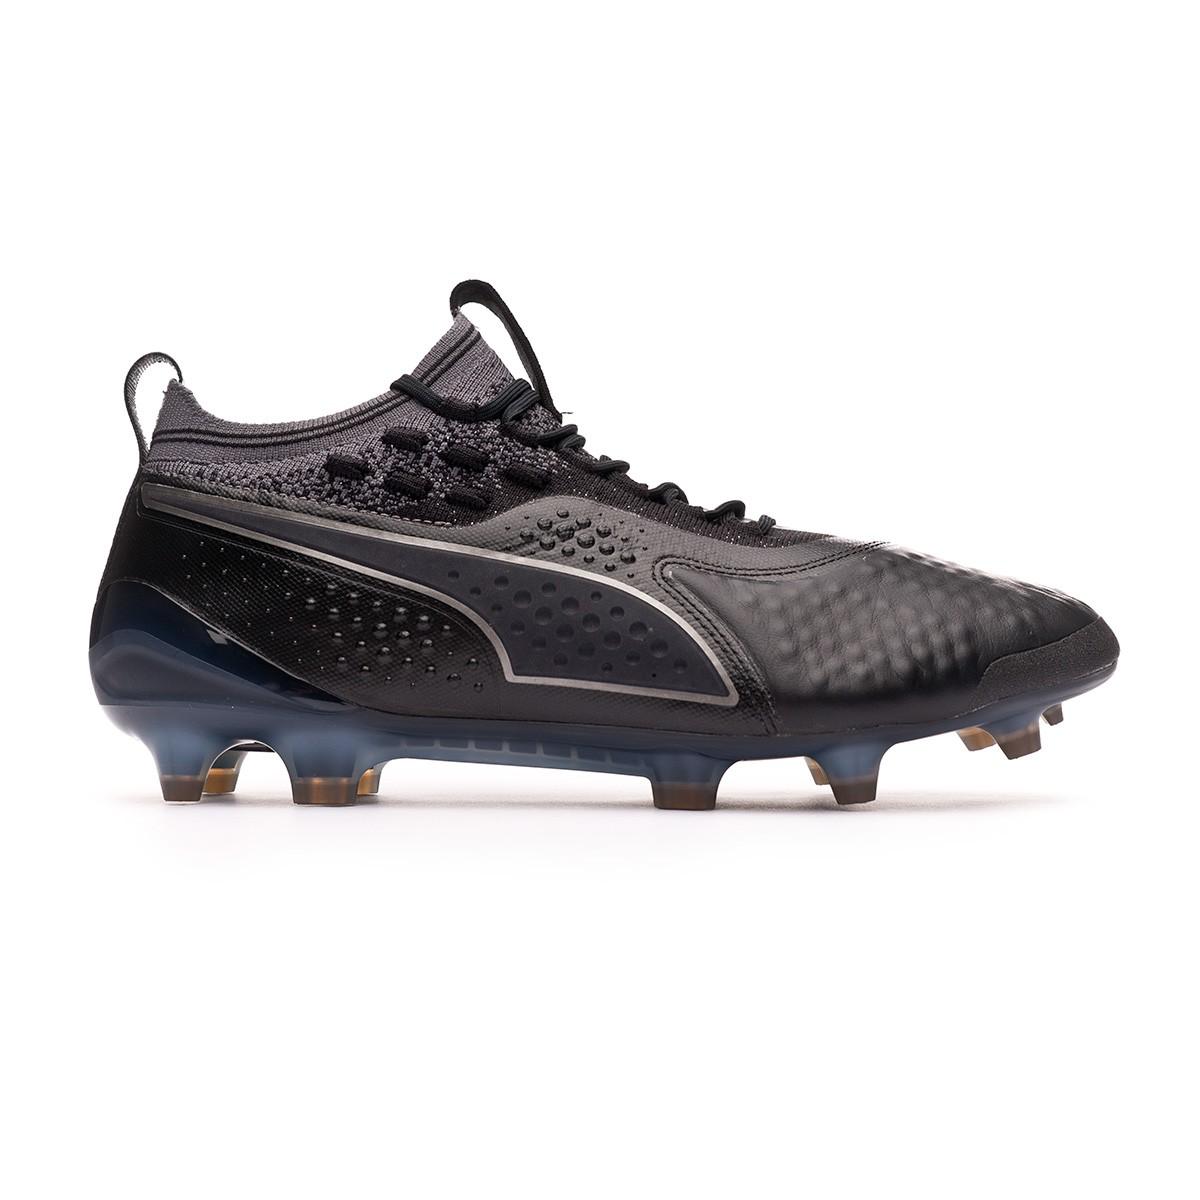 7ee84e515406 Football Boots Puma One 1 Skin FG AG Puma black - Football store Fútbol  Emotion